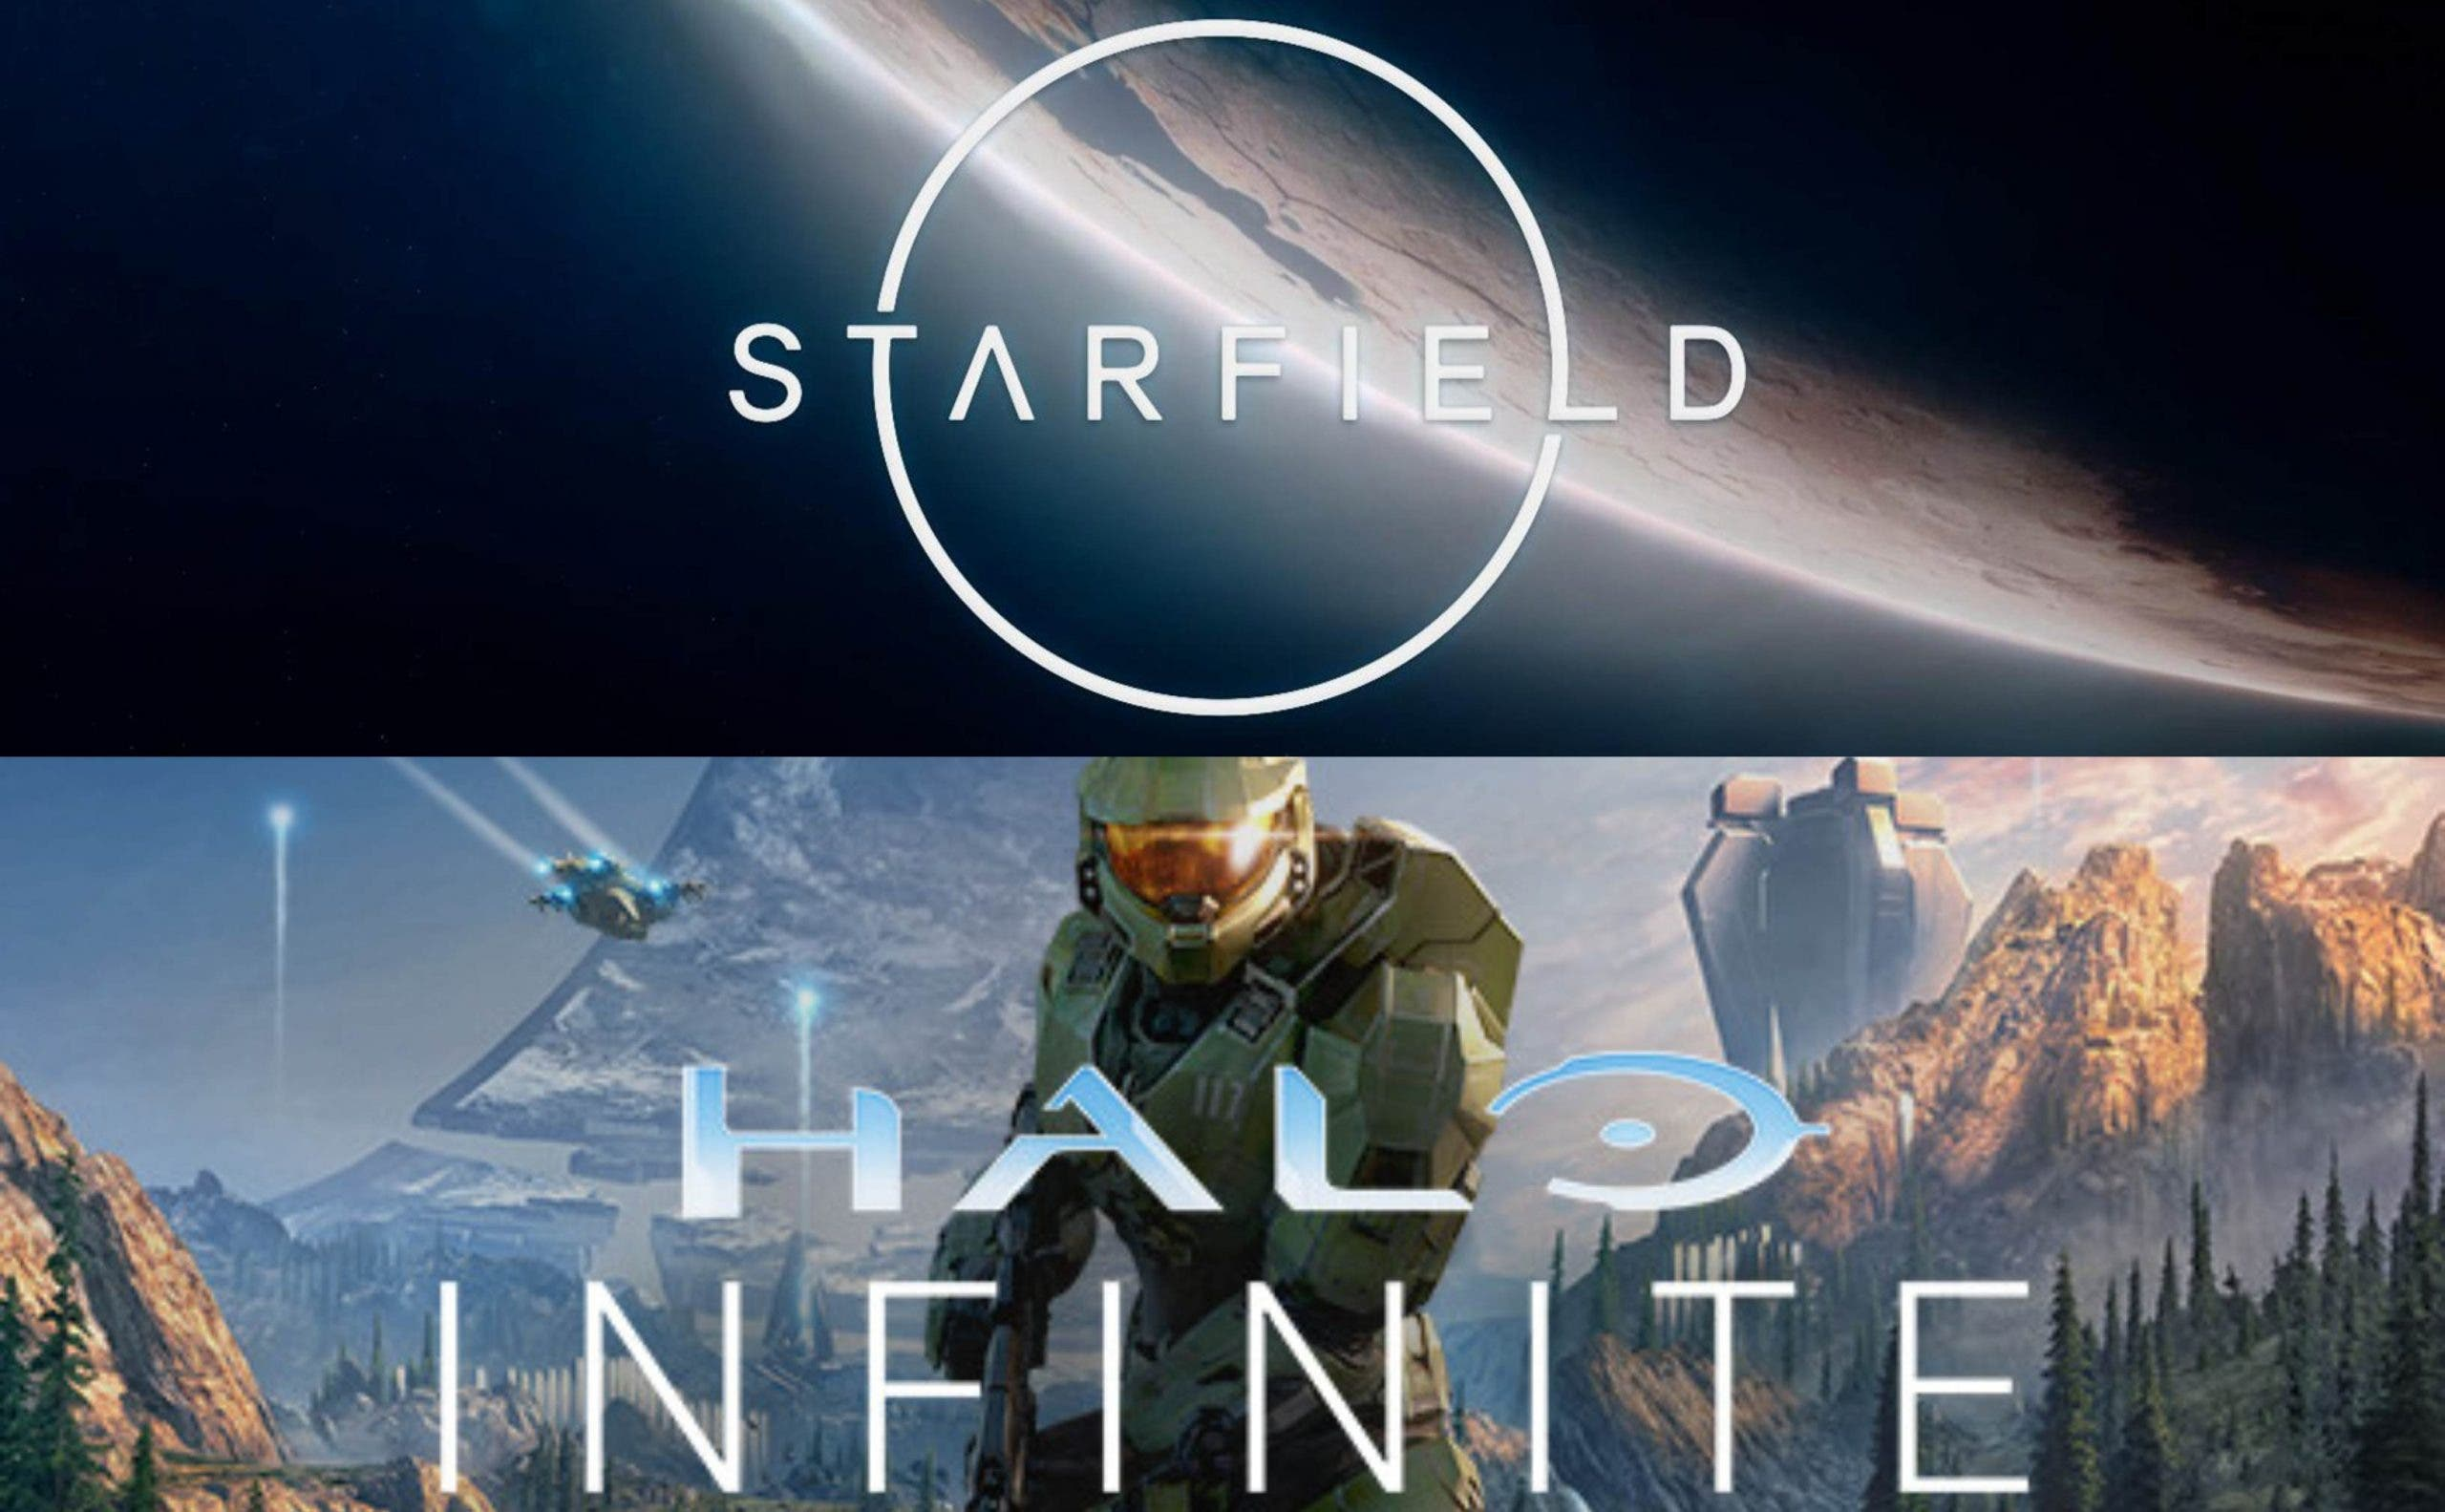 Starfield o Halo Infinite podrían acabar retrasándose